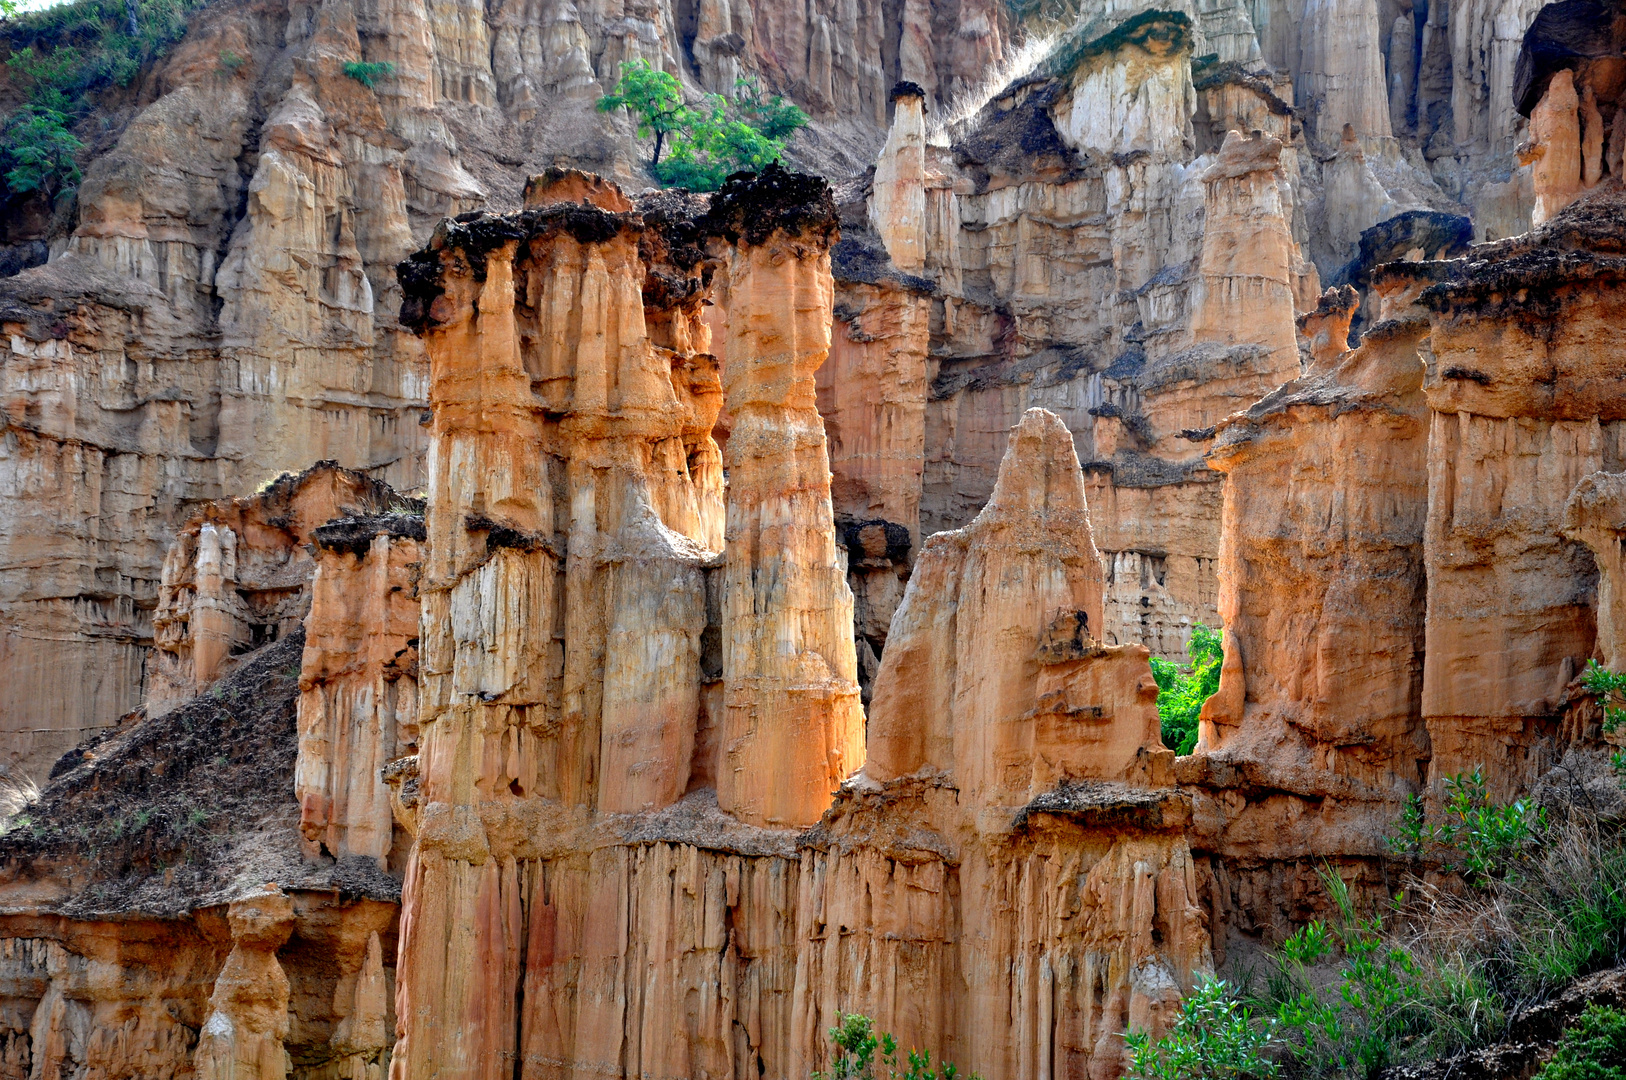 China Yunnan Erdwald Yuanmo, nicht Bryce Canyon